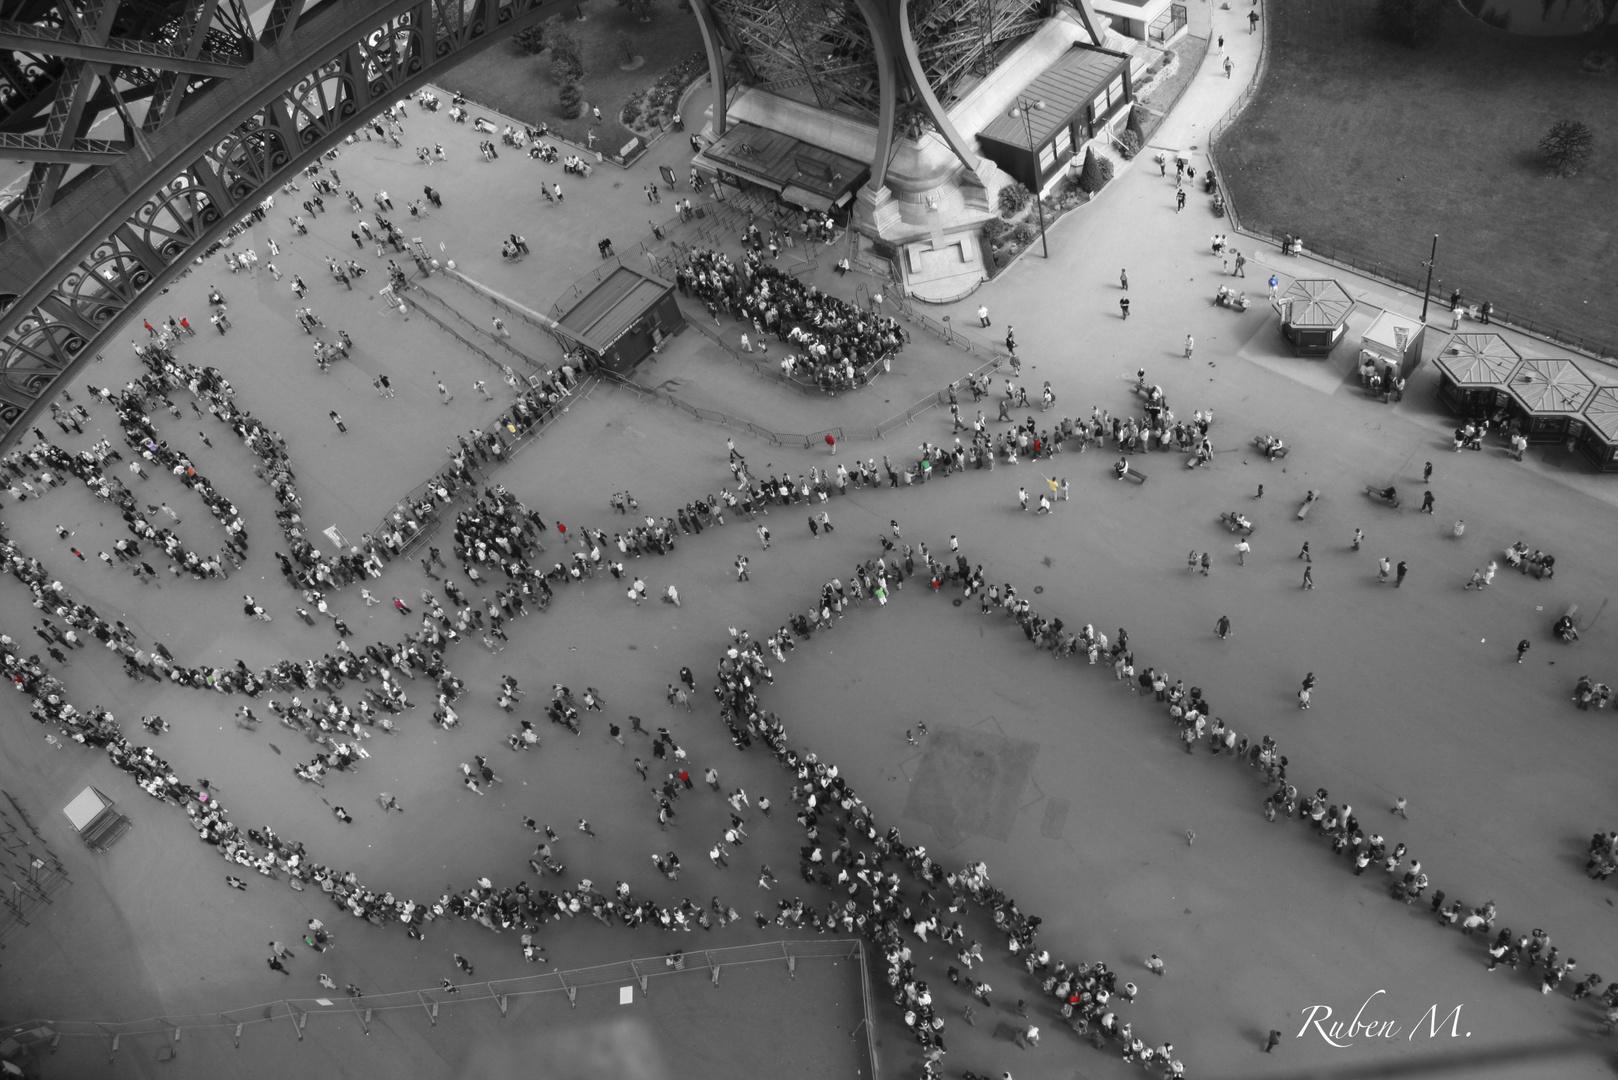 Warteschlange Eiffelturm